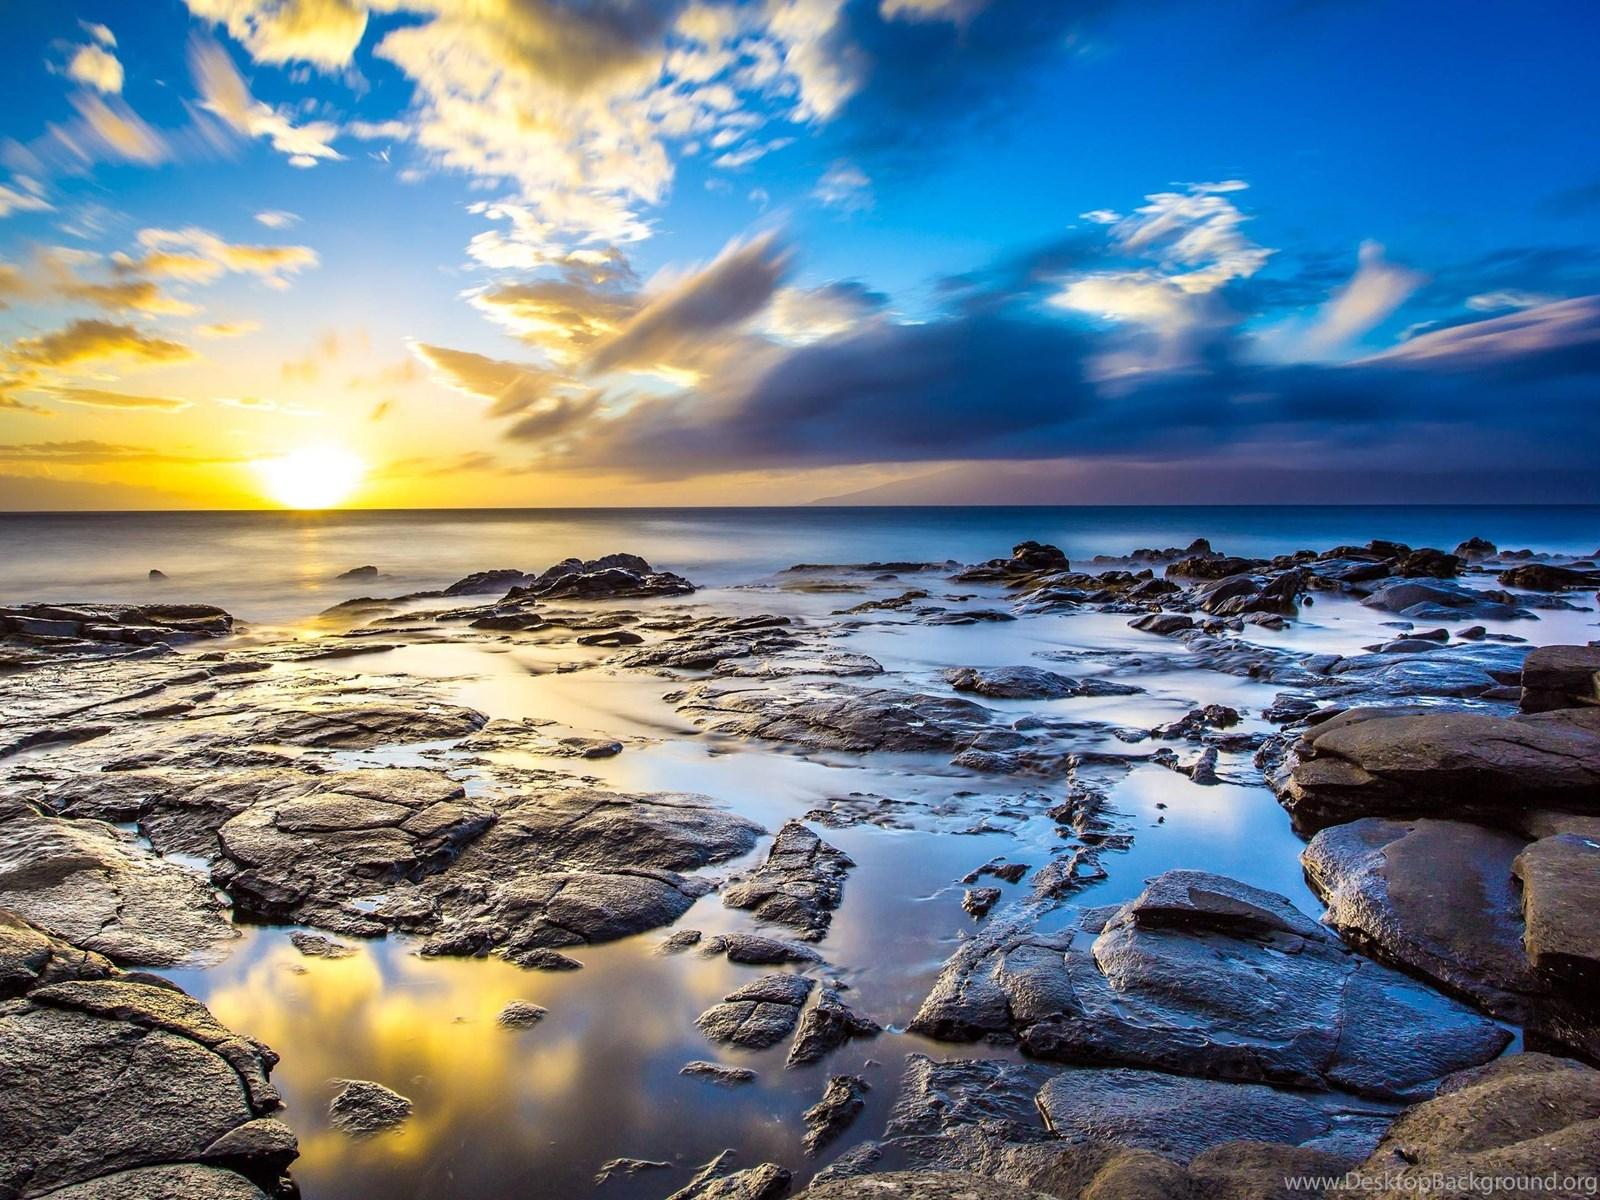 Beach With Sun Setting 4k Wallpapers Full 1080p Ultra Hd